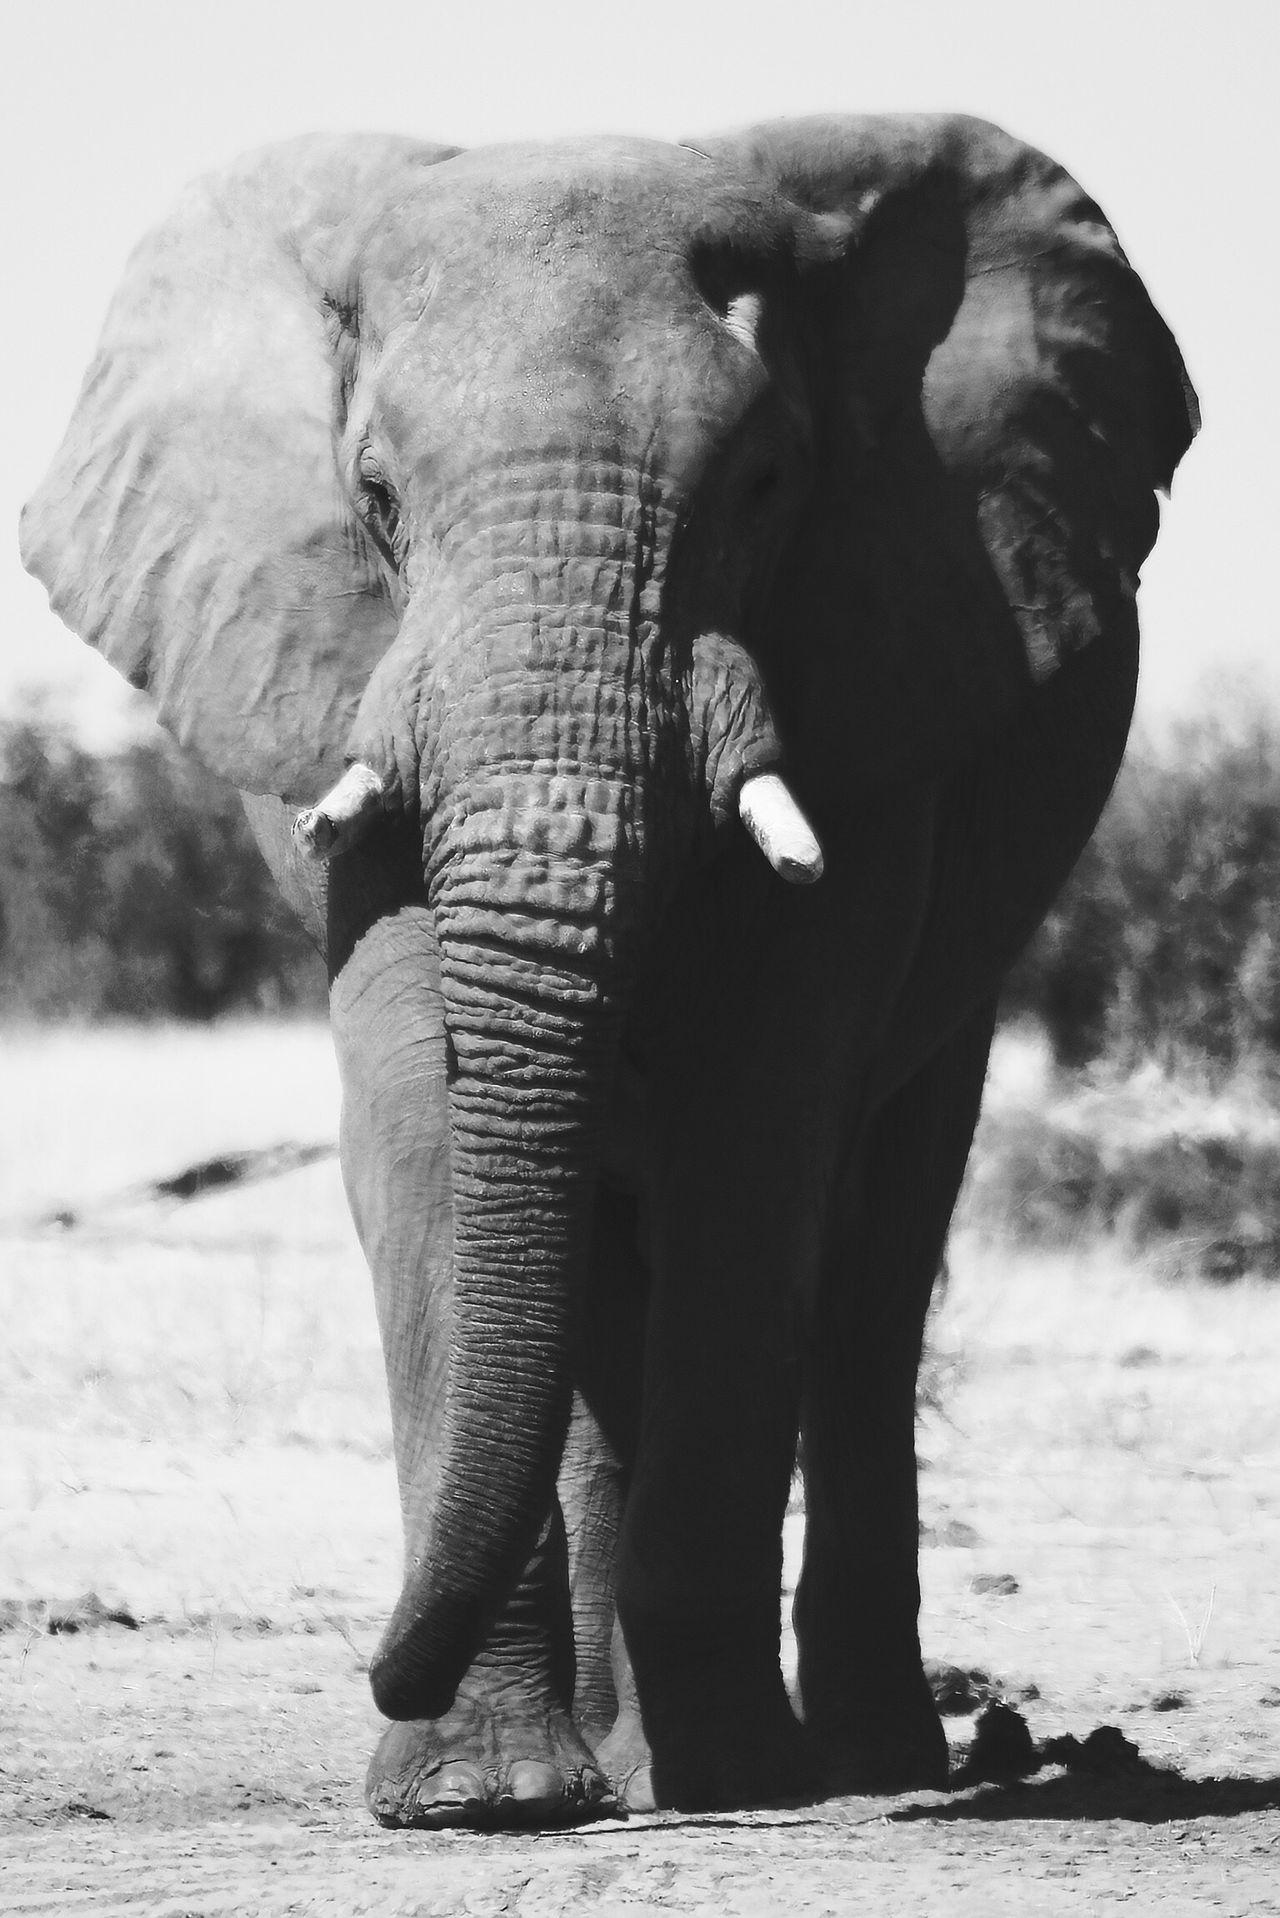 Big is beautiful Elephant Animal Themes One Animal Animal Trunk Front View Animals In The Wild Mammal Nature Tusk No People Animal Wildlife Safari Animals African Elephant Trunk Close-up Africanamazing Botswana Safari Wildlife Photography Wildlife & Nature EyeEm Best Shots Tranquil Scene